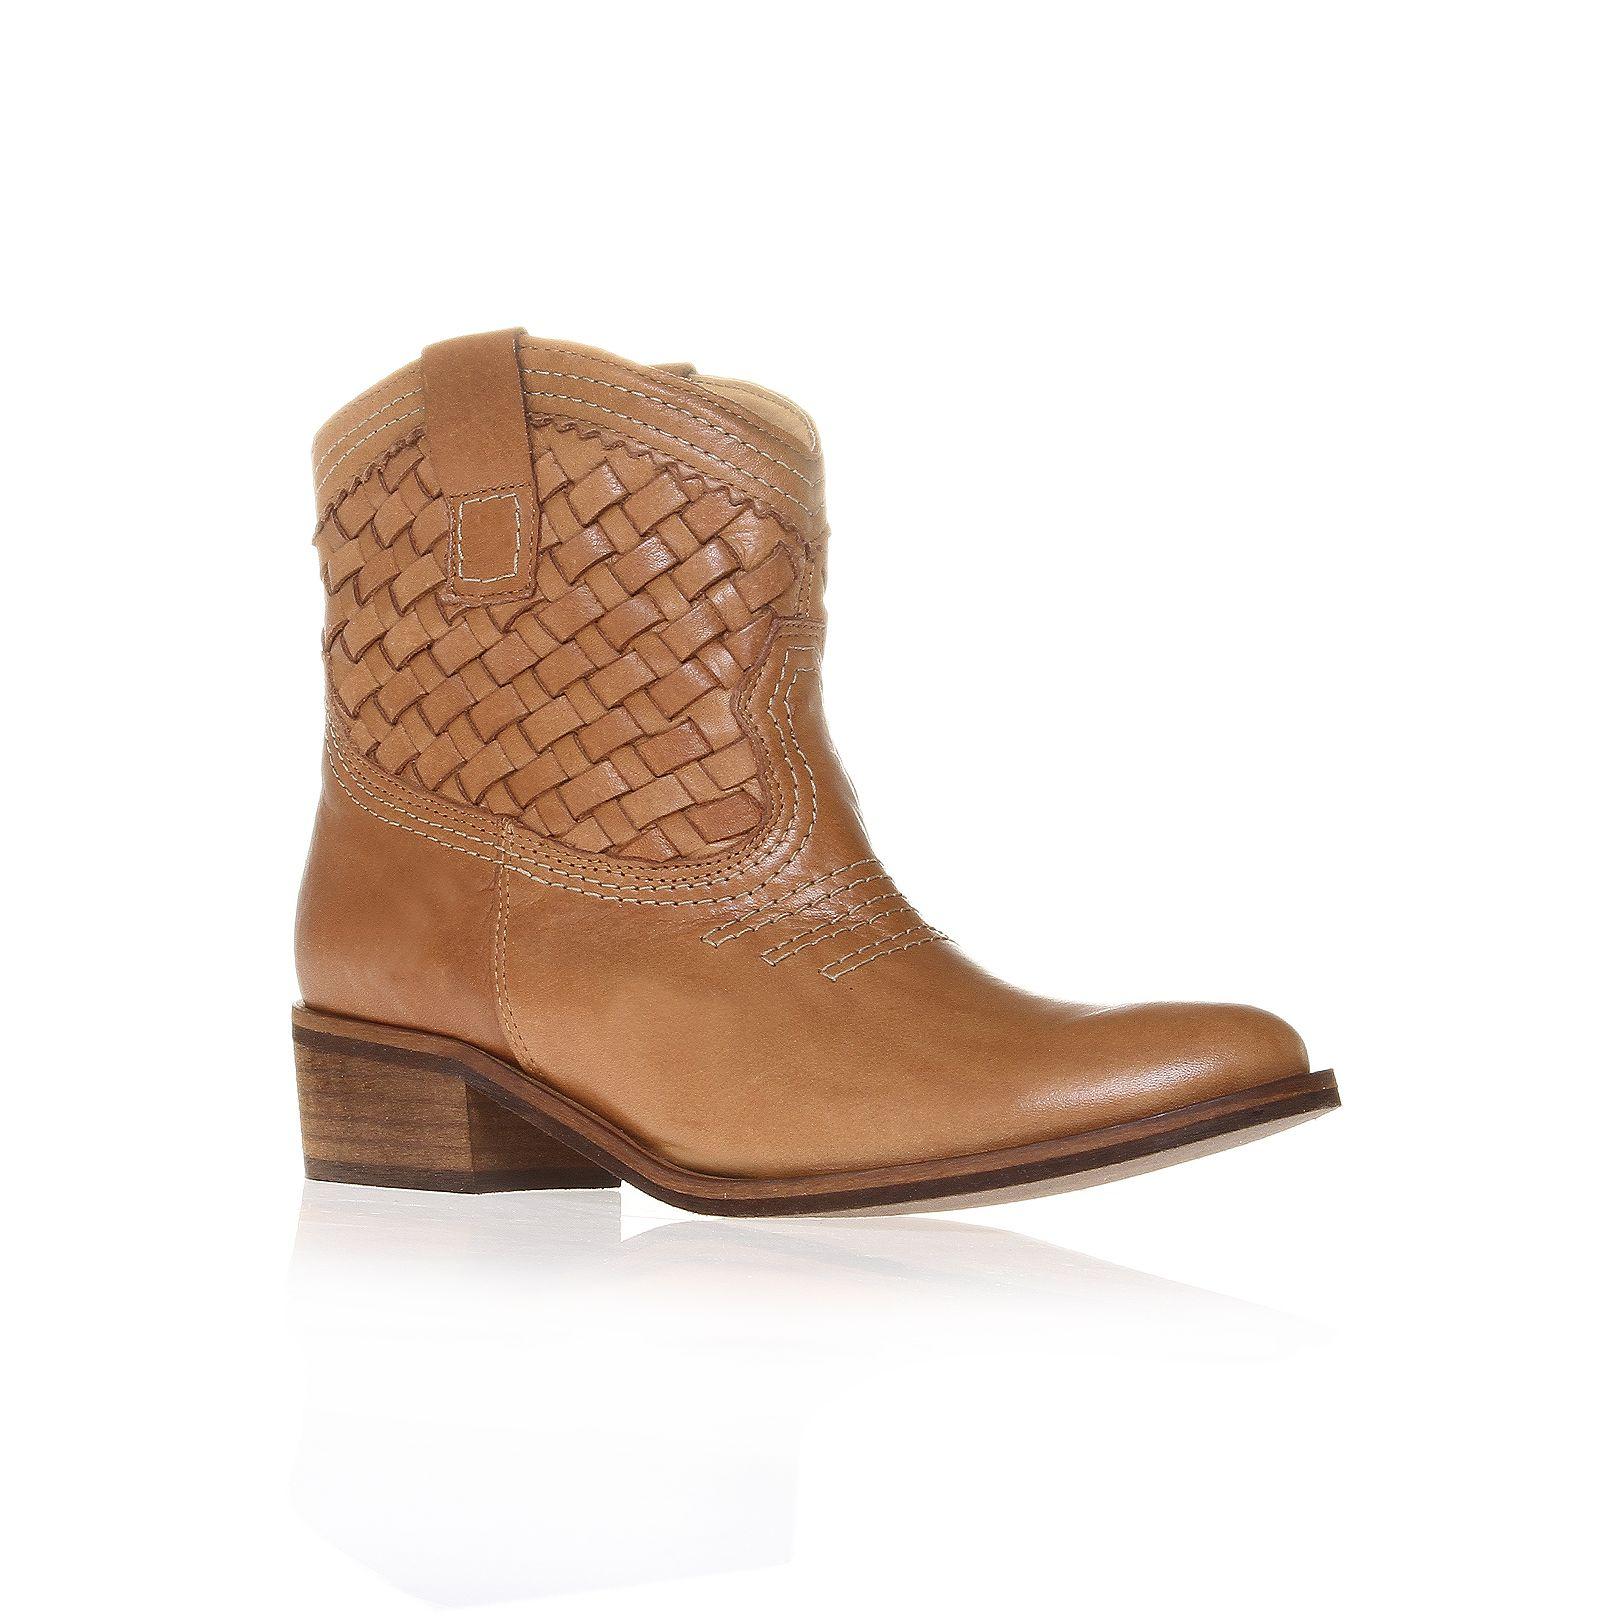 Carvela Kurt Geiger Salt Cowboy Style Ankle Boots In Brown For Men (Tan) | Lyst